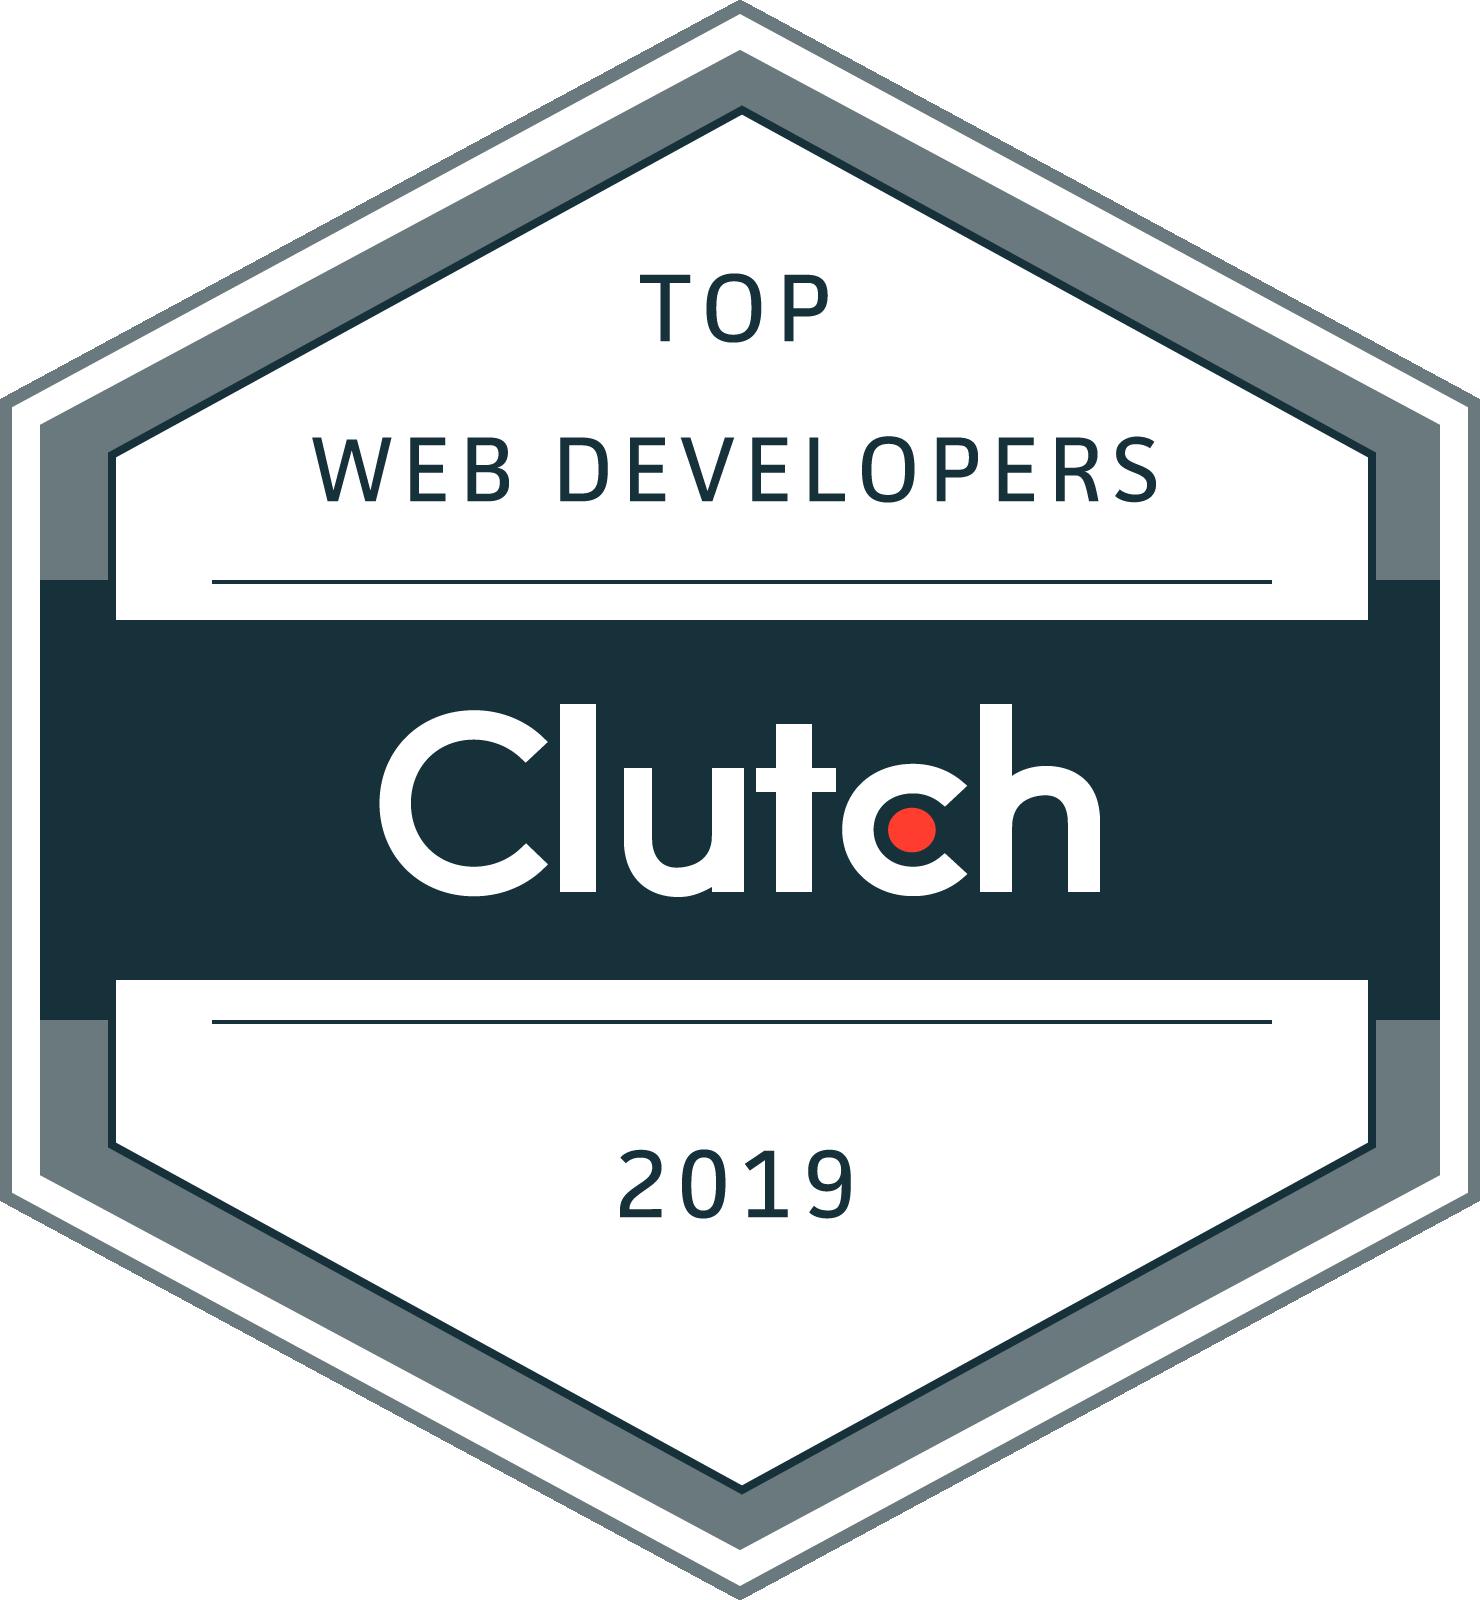 Devcom software development top 10